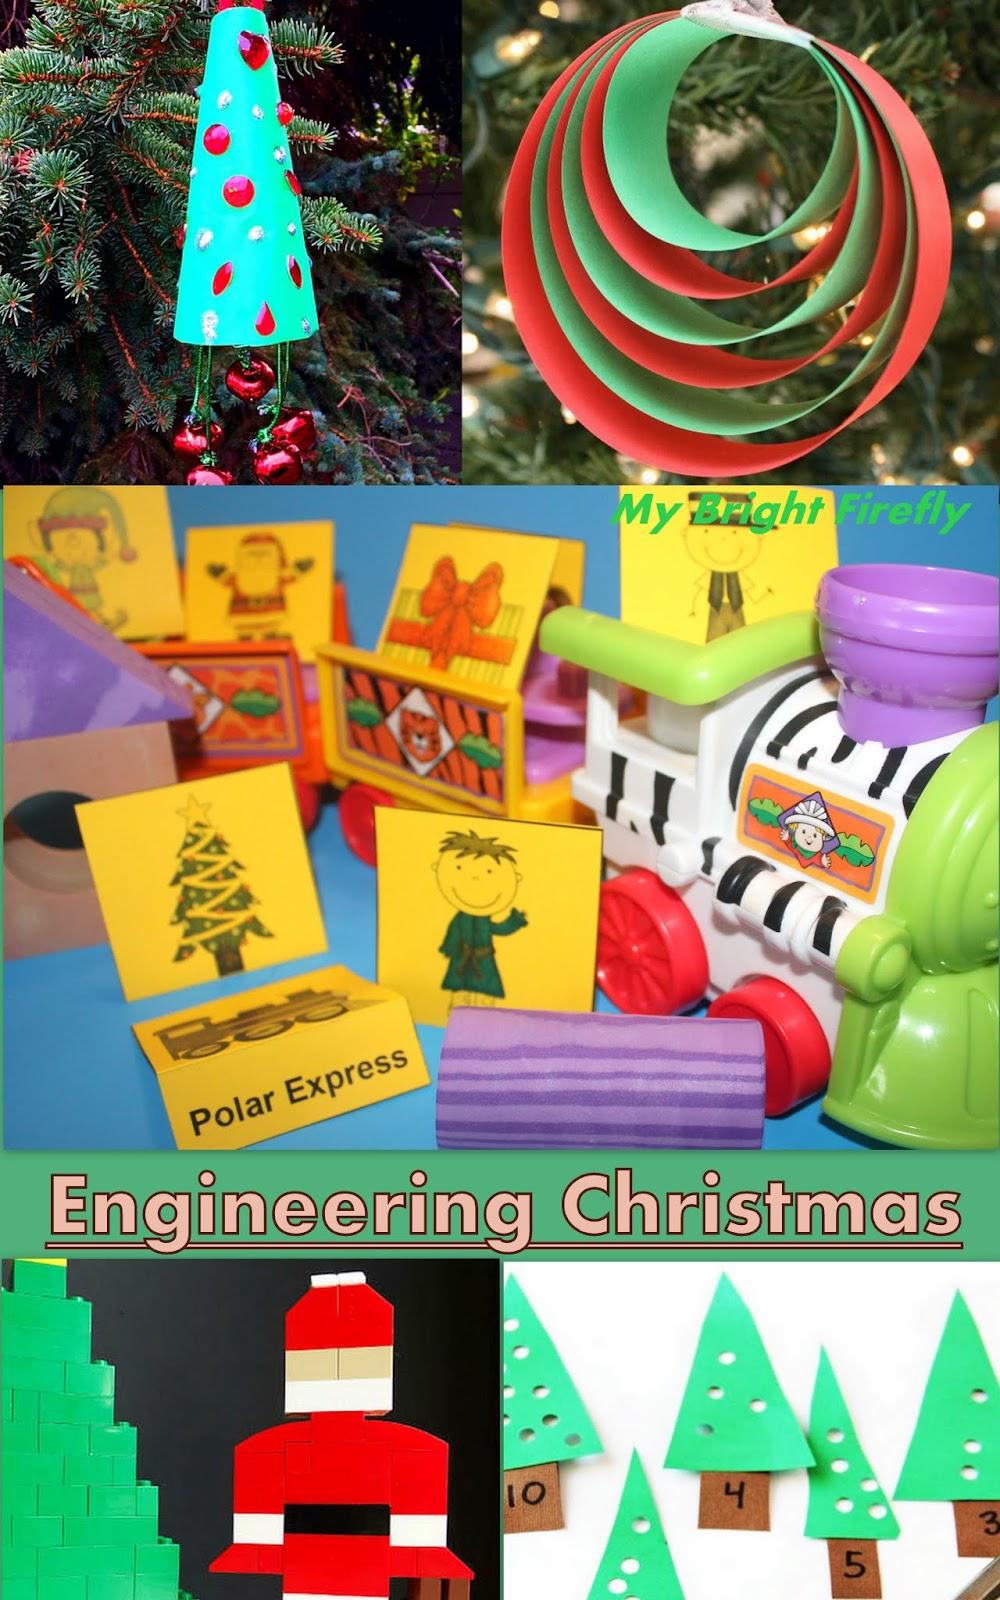 My Bright Firefly: 15 Ways to Engineer a Fun Christmas: STEM ...